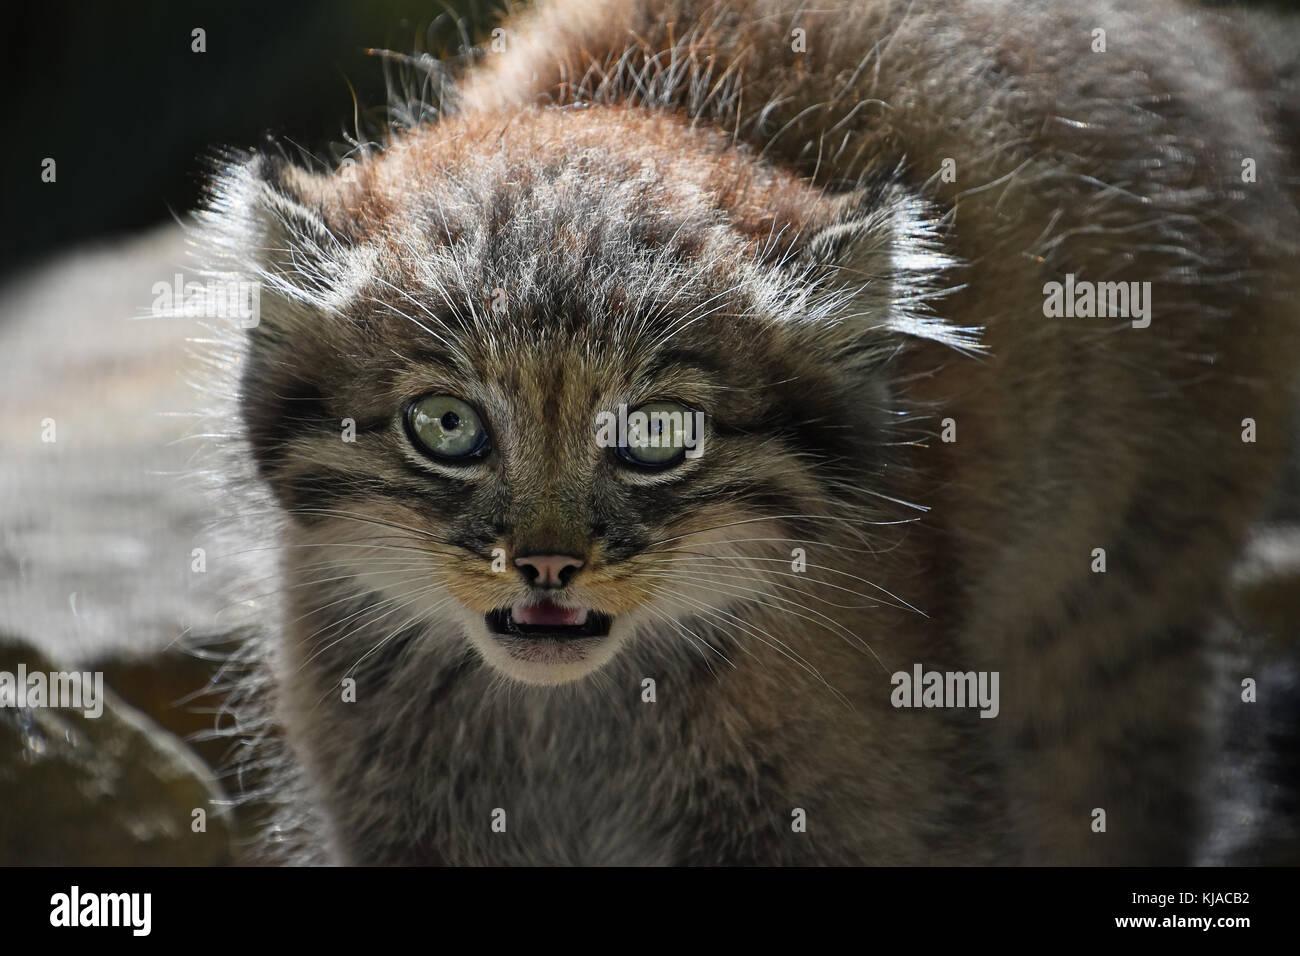 walmart cat flea medicine